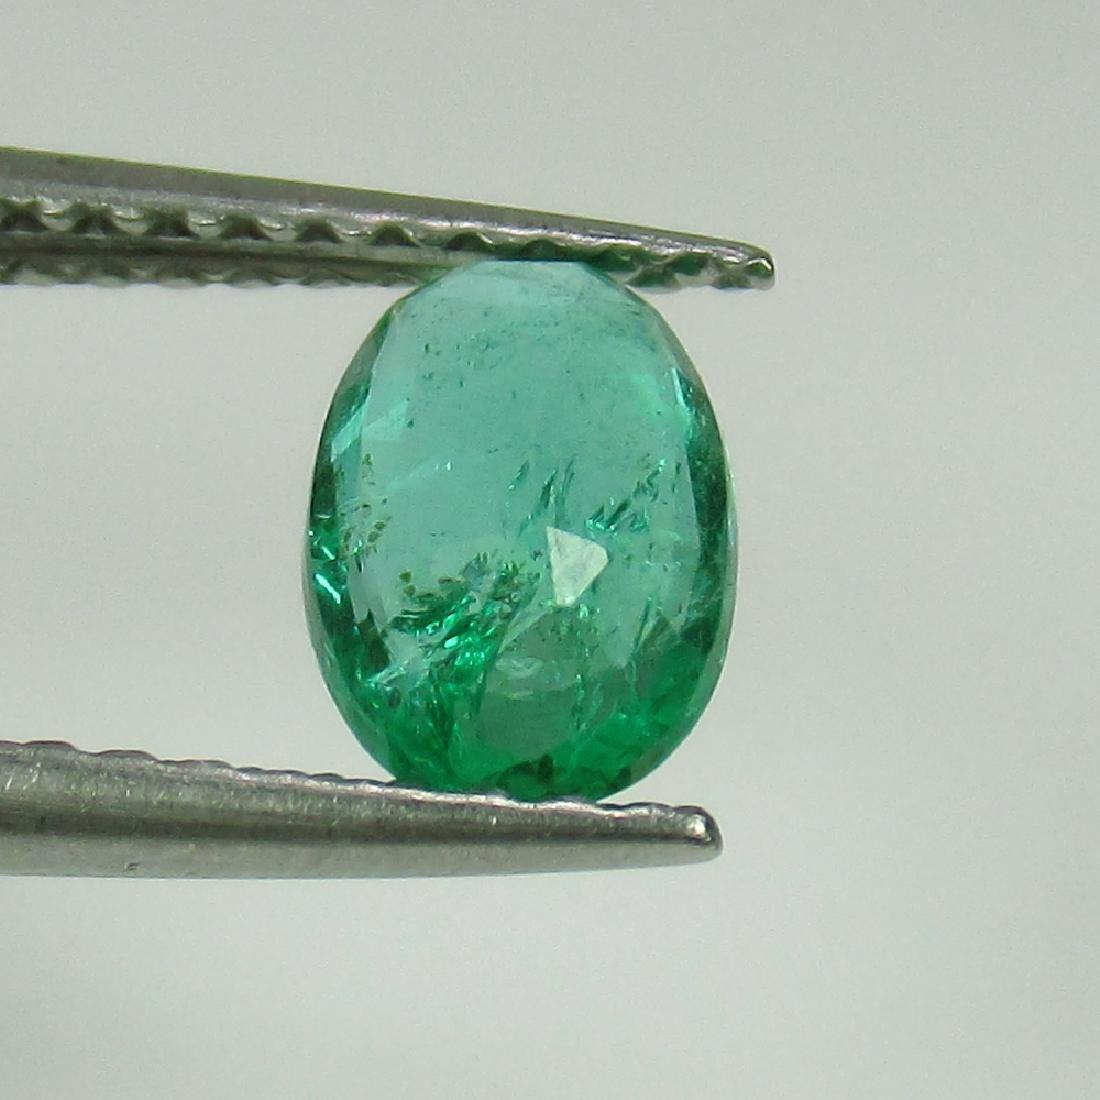 0.62 Ctw Natural Zambian Emerald Nice Oval Cut - 2